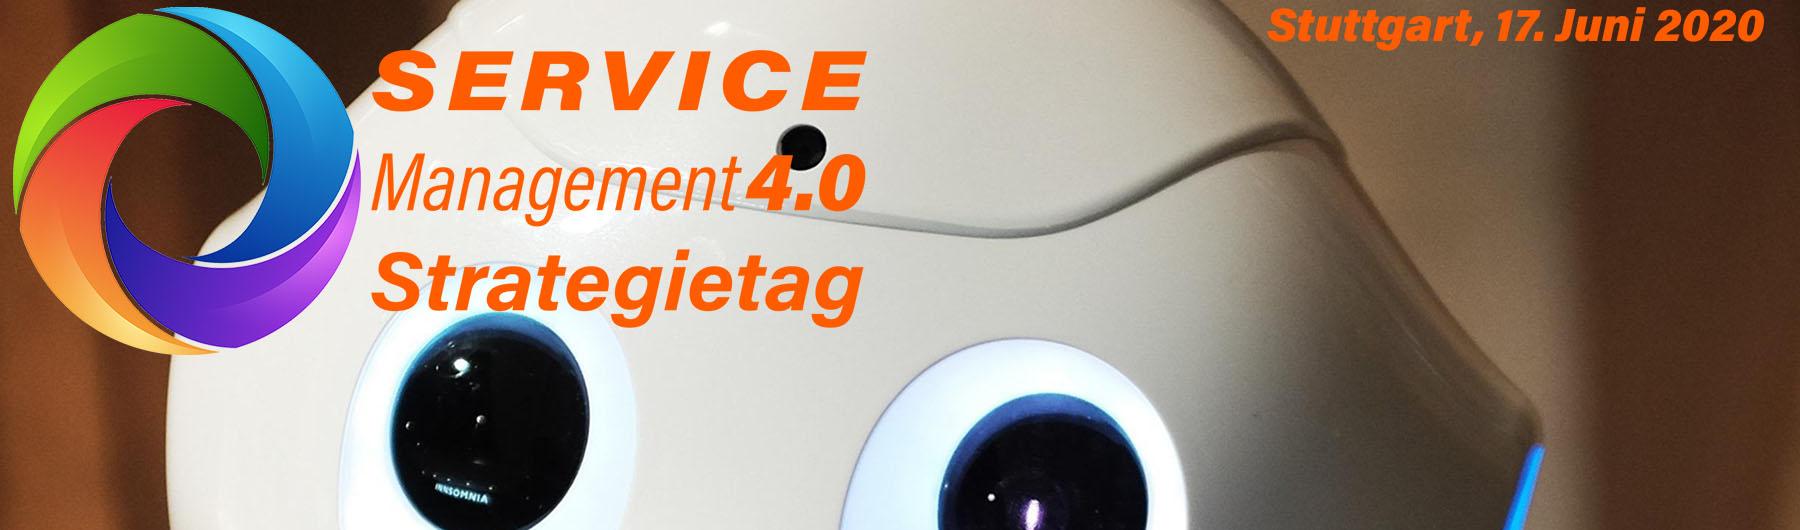 Service Management 4.0 Strategietag